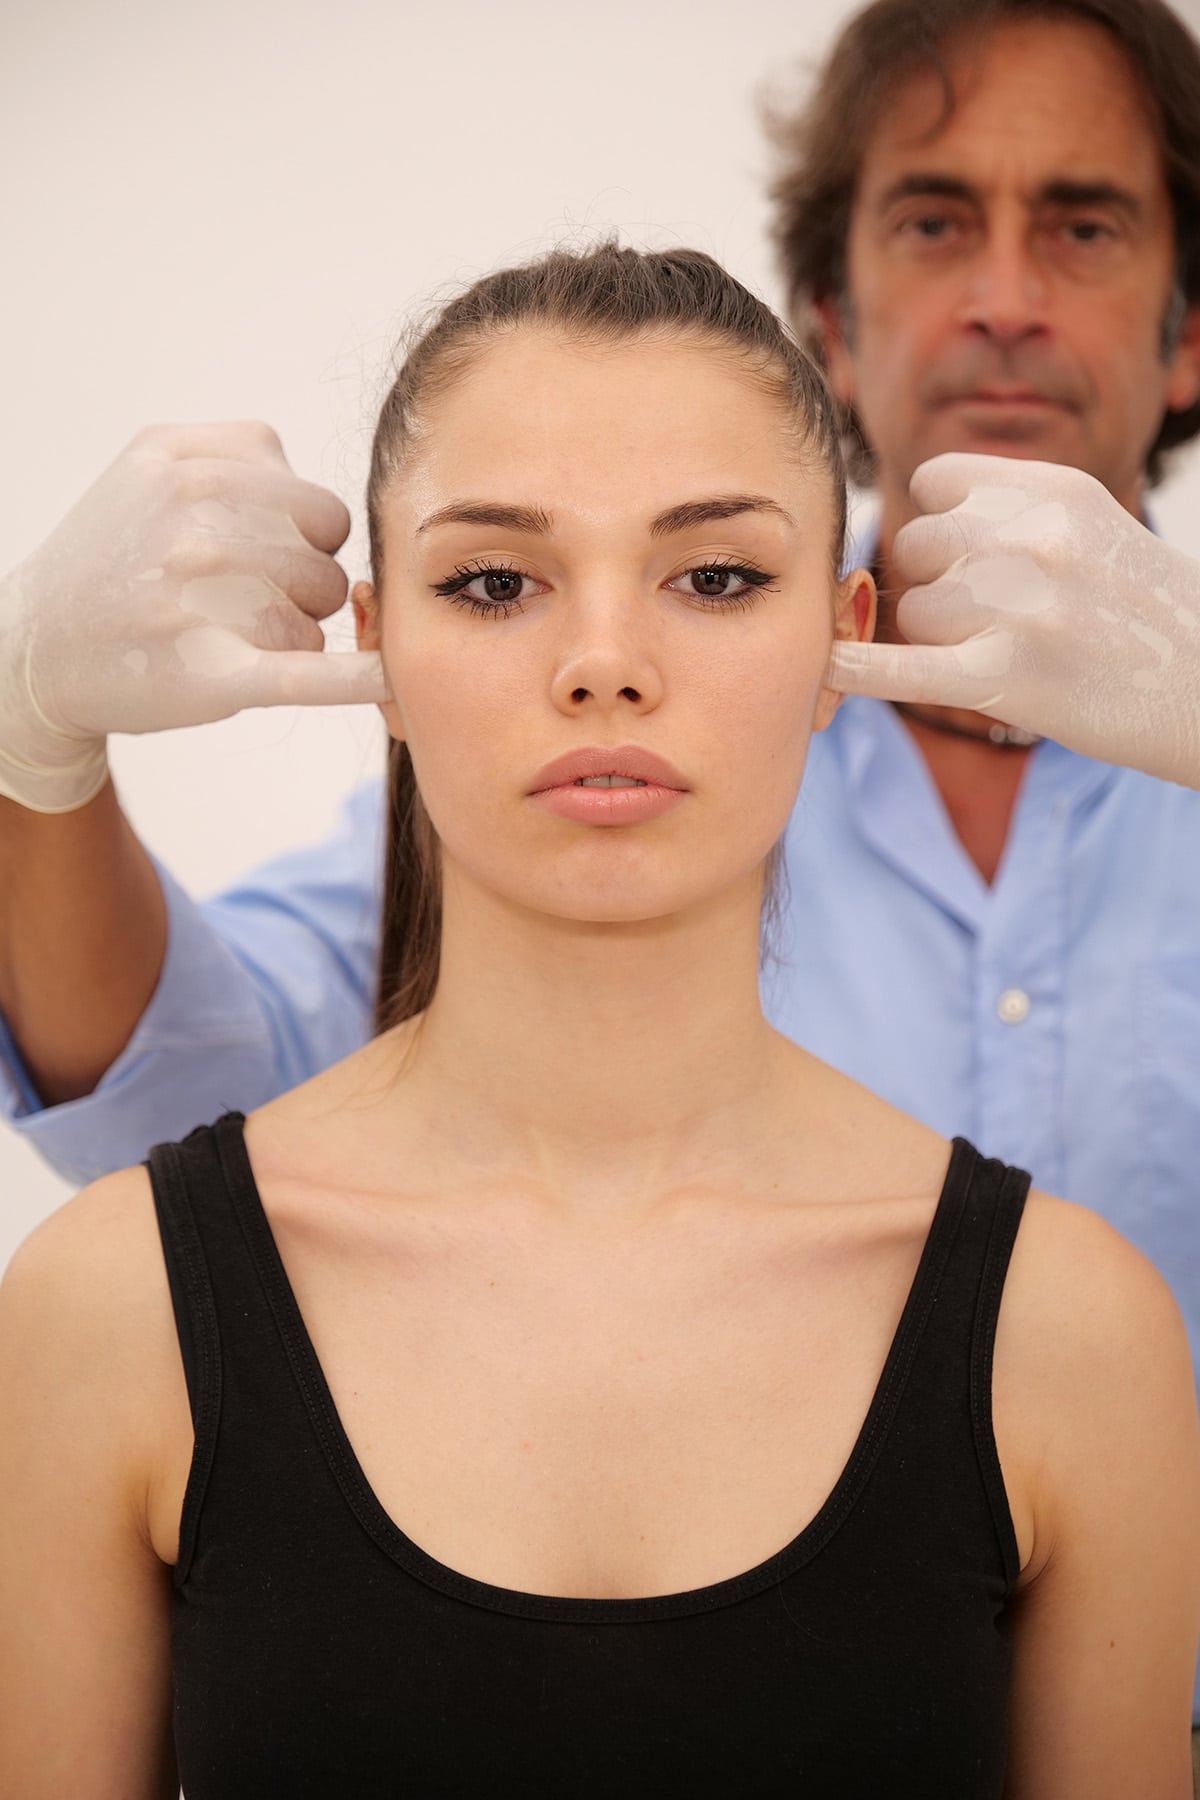 Video Corso Online Odontoiatria e Postura